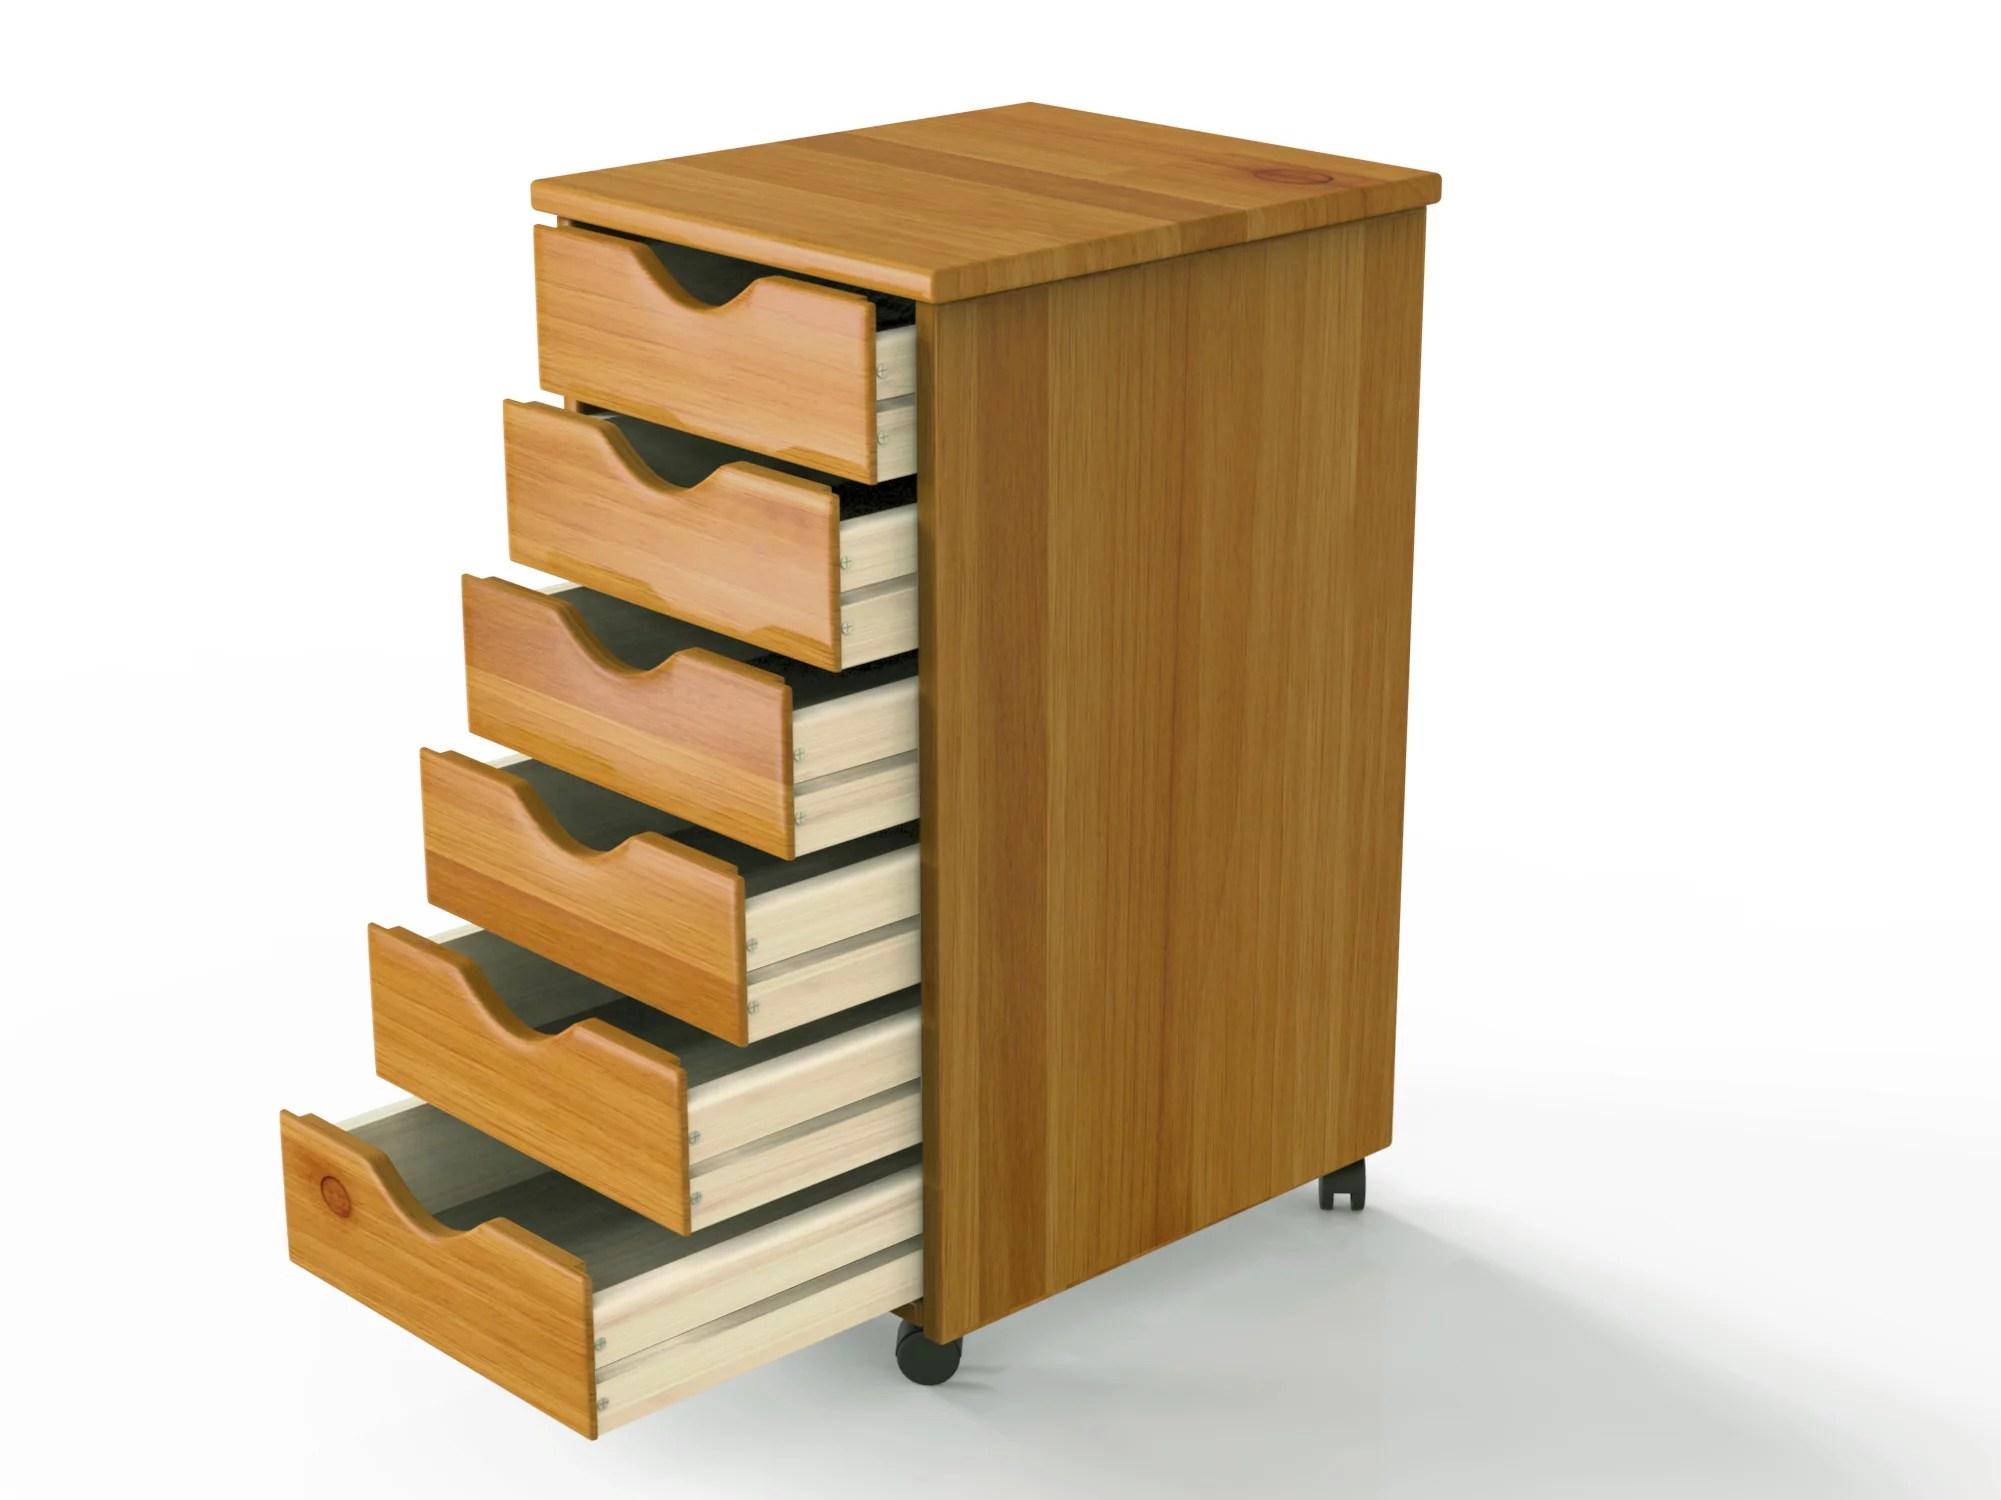 Adeptus Wood Rolling Craft Storage Drawers Walmart Com Walmart Com